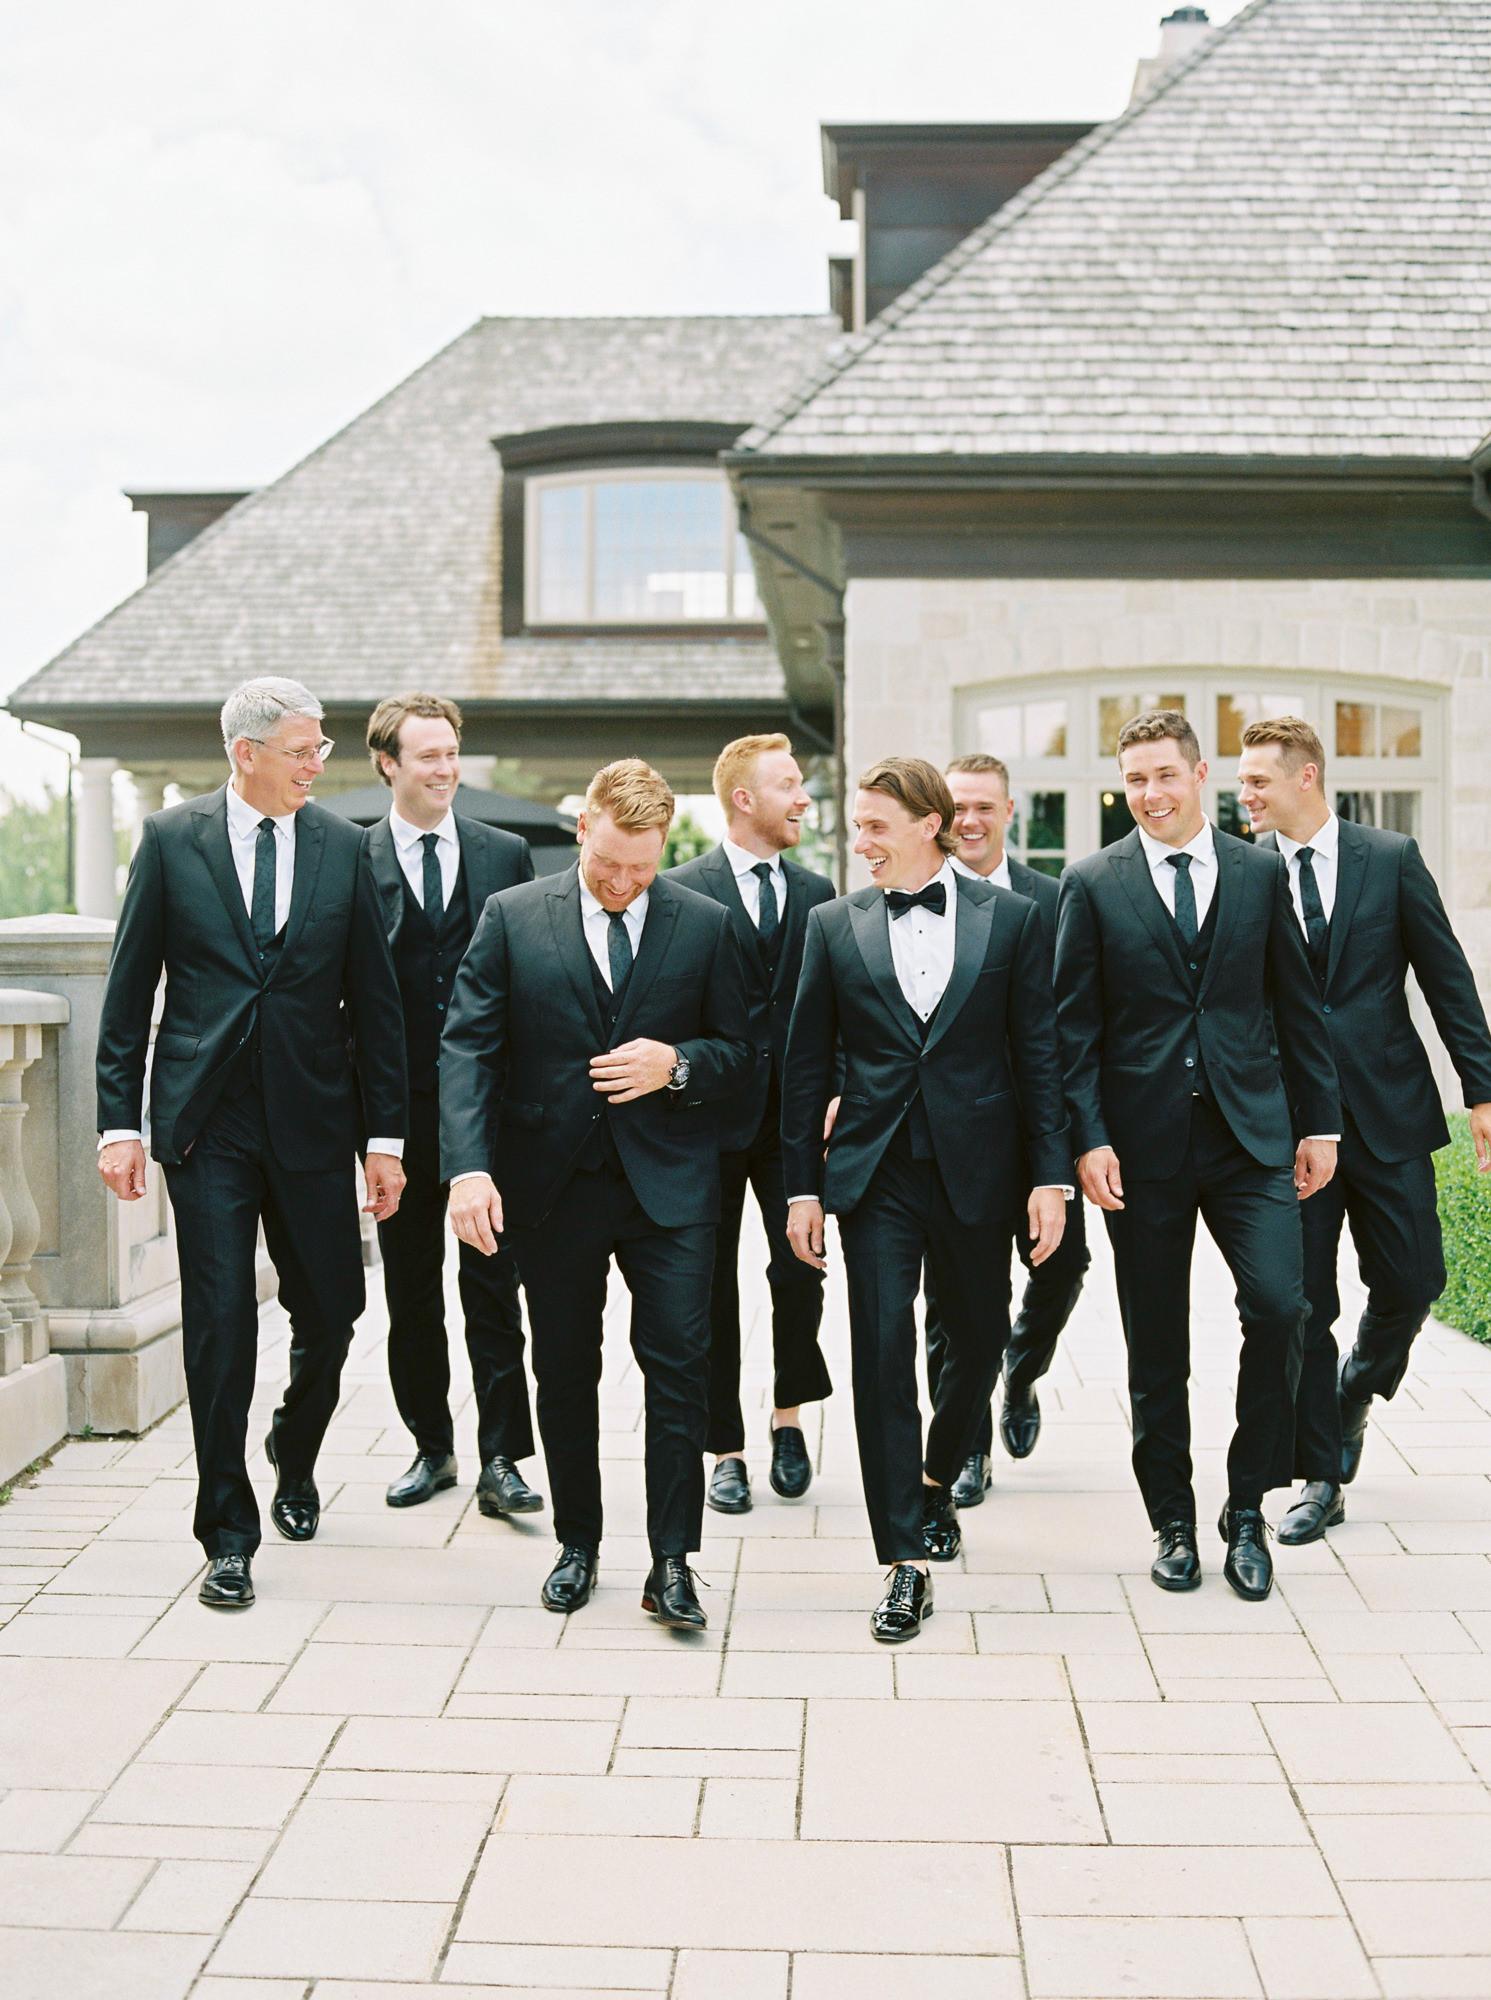 groom with groomsmen smiling all wearing black suits